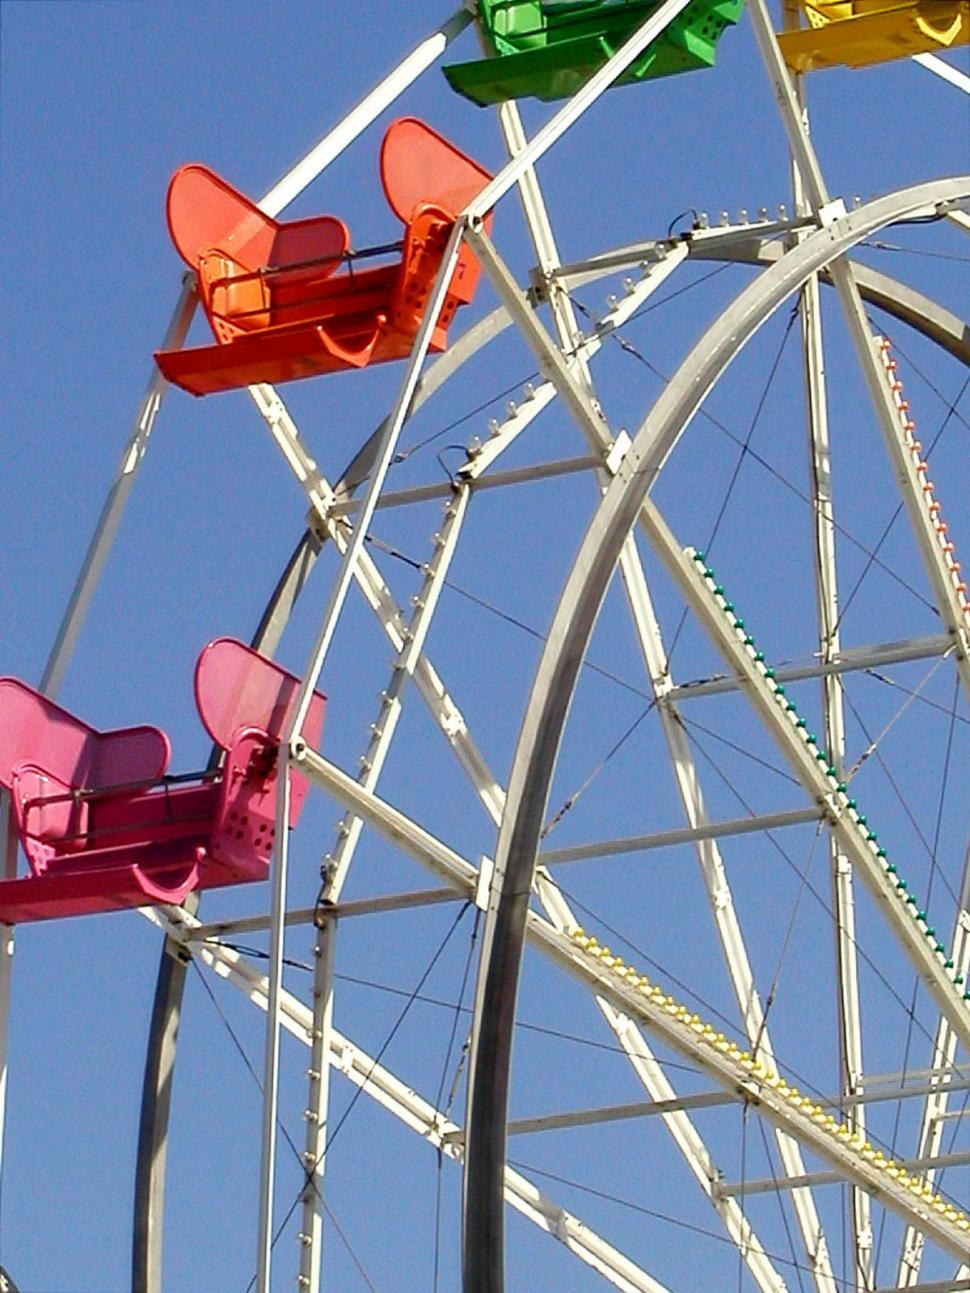 Download Free Stock HD Photo of Ferris Wheel Online